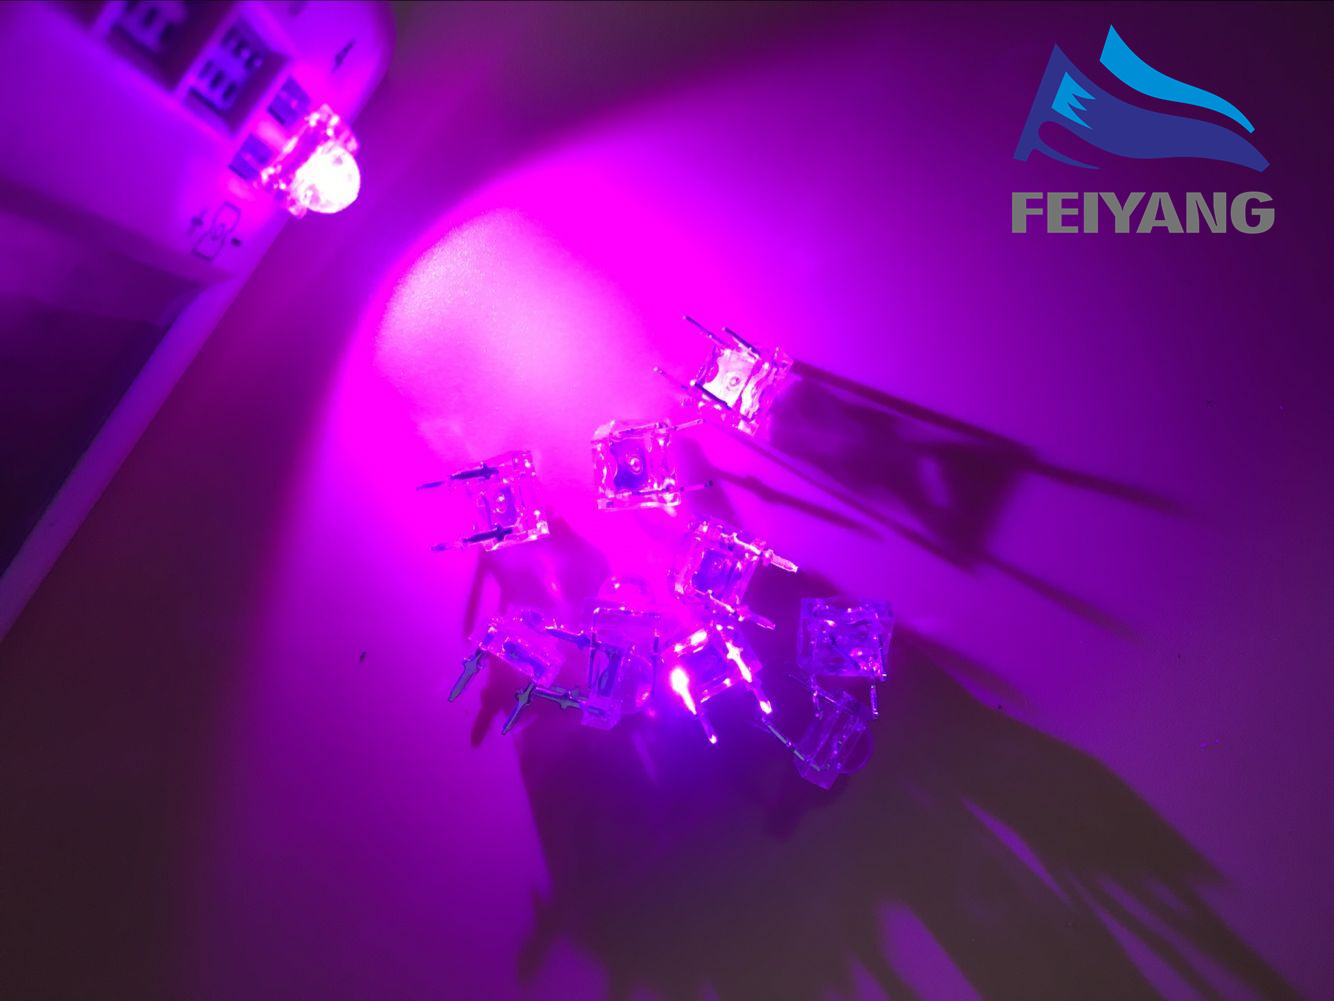 500pcs 5mm Clear Lens pink Piranha LED Diode Transparent Light Emitting Diode LED 5mm Round Top